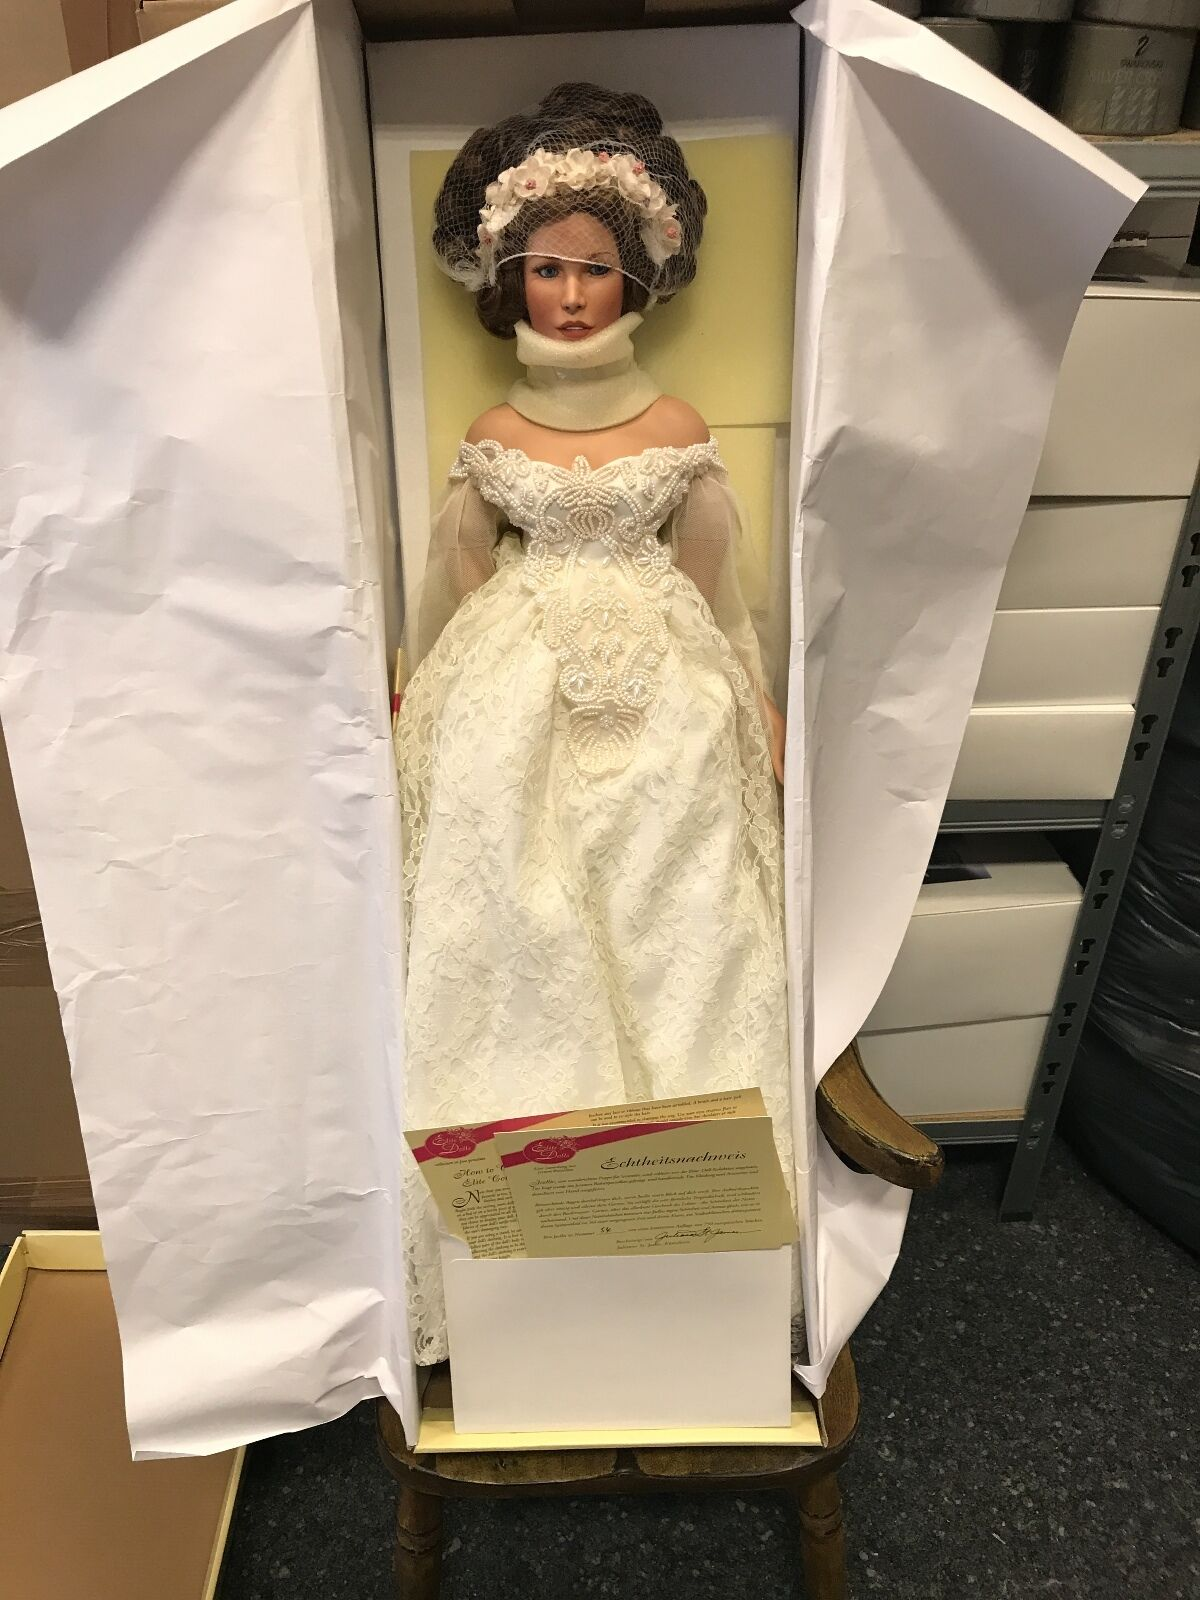 Künstlerpuppe Porzellan Doll 70 cm. Top Zustand.